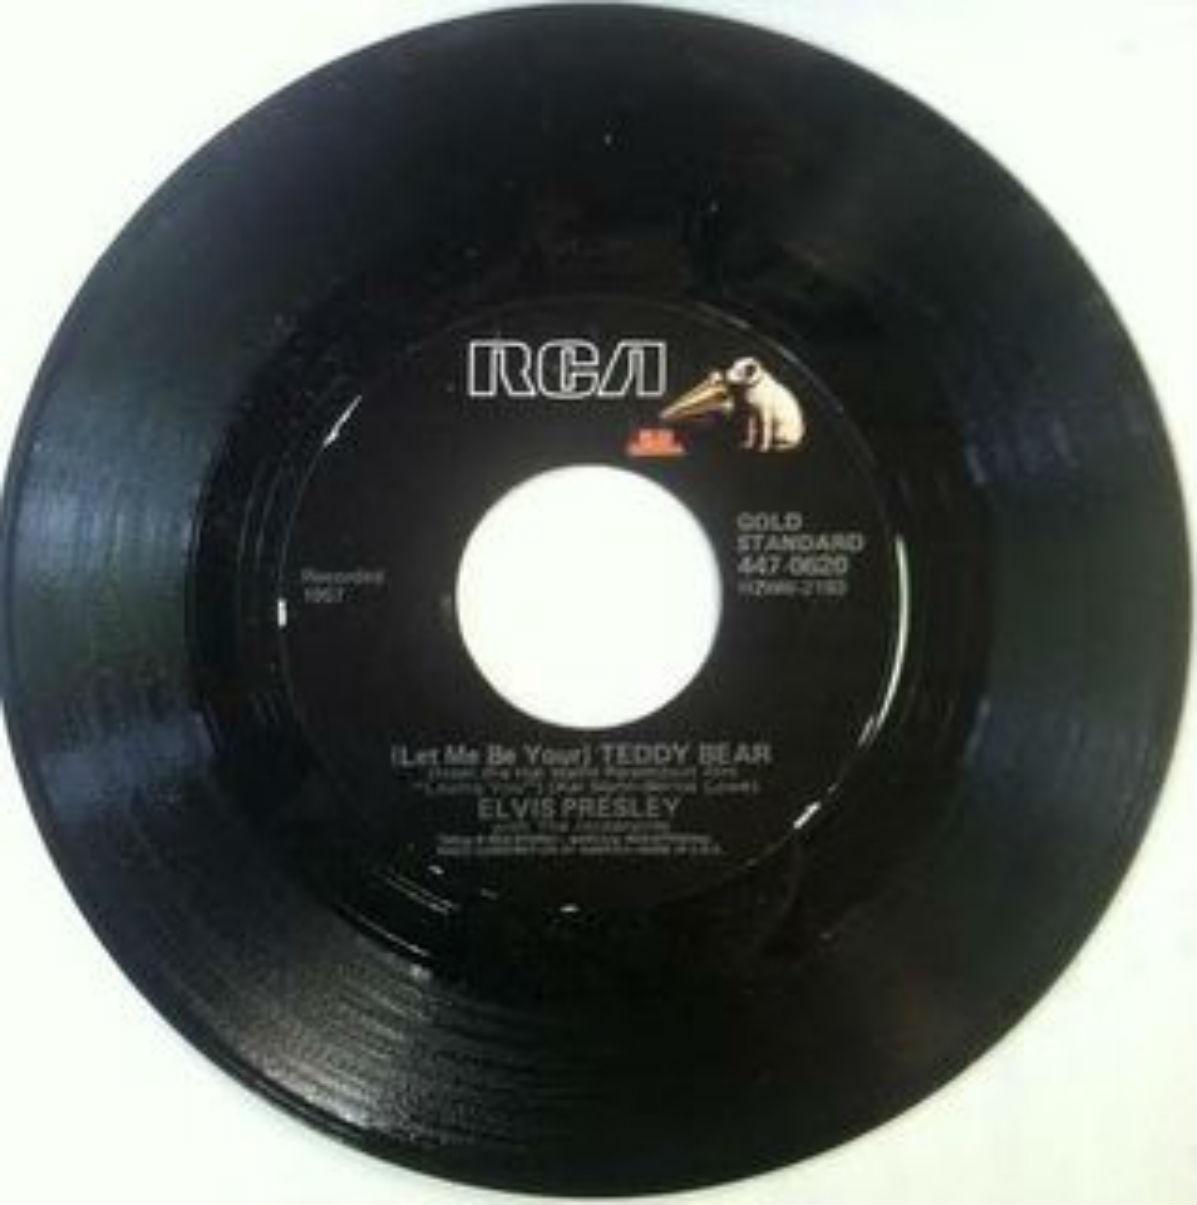 Elvis Presley / (Let Me Be Your) Teddy Bear